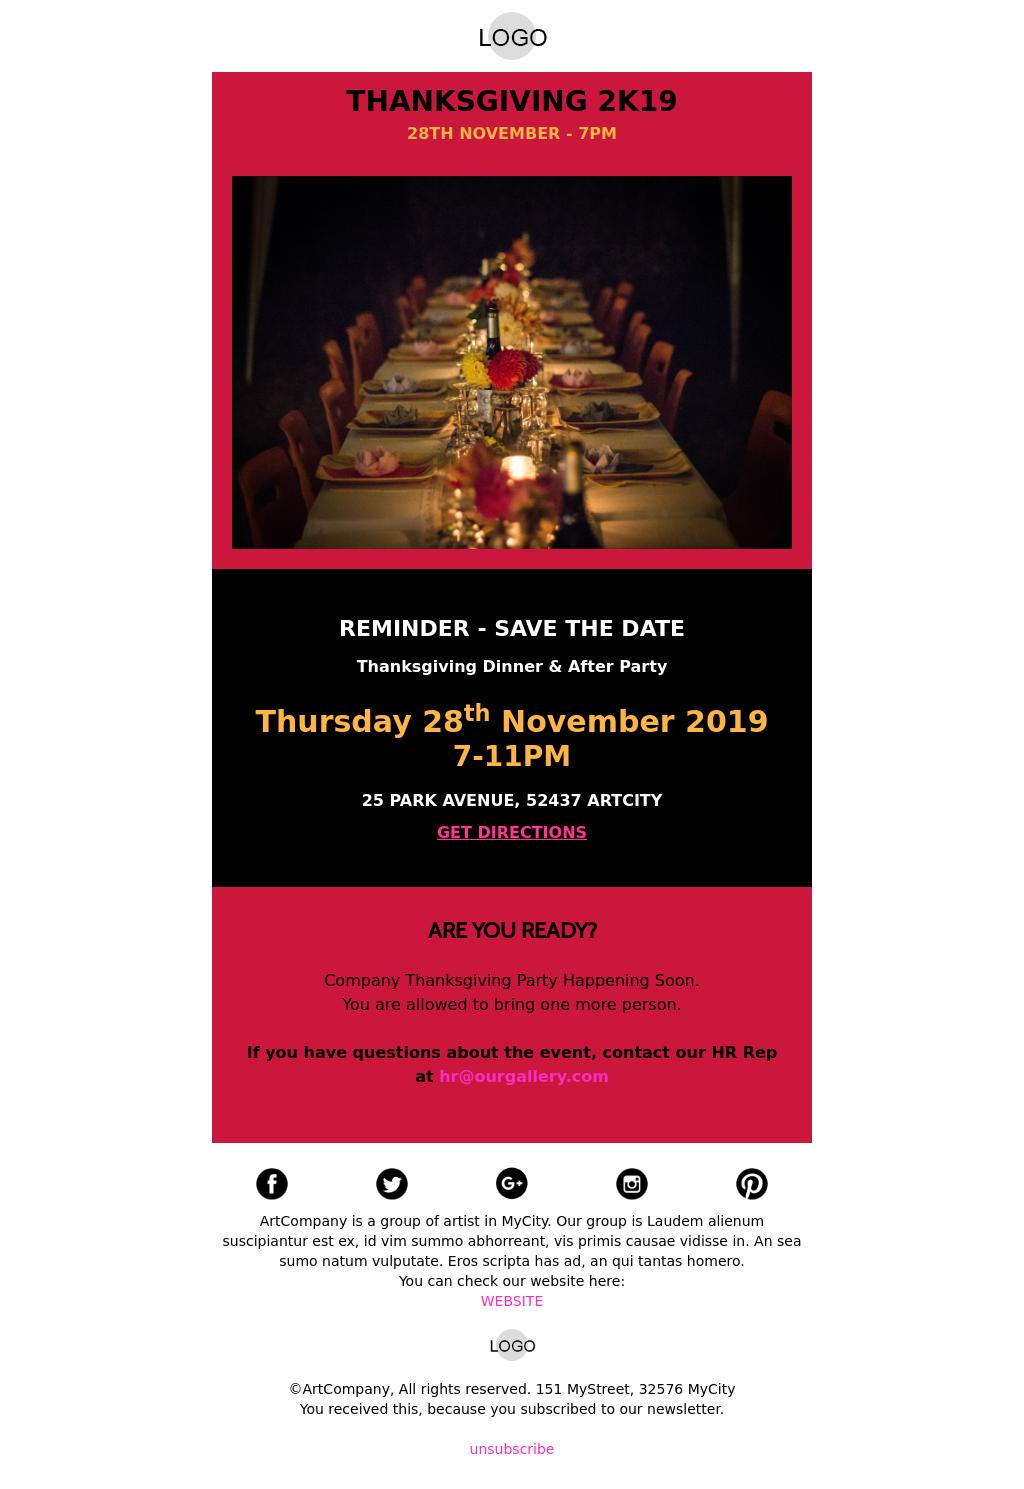 Thanksgiving Dinner Invitation Email